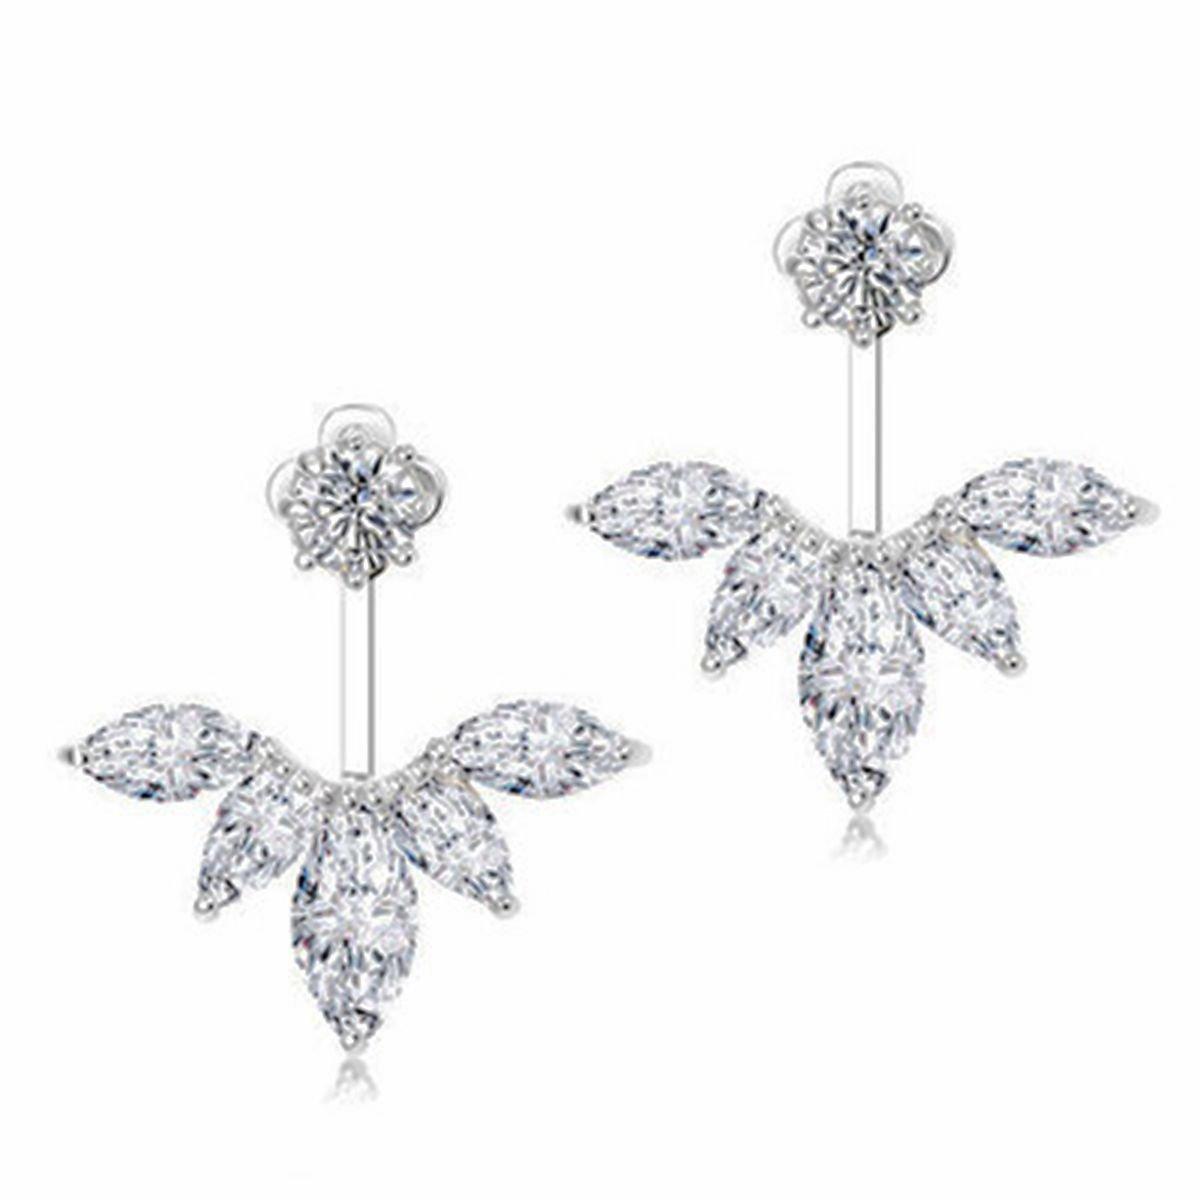 5be97f3dfb9 Amazon.com  Odette 18K White Gold Plated Clear Crystal Leaf Feather Ear  Jacket Earrings Back Ear Cuffs Stud Earring (Silver)  Jewelry